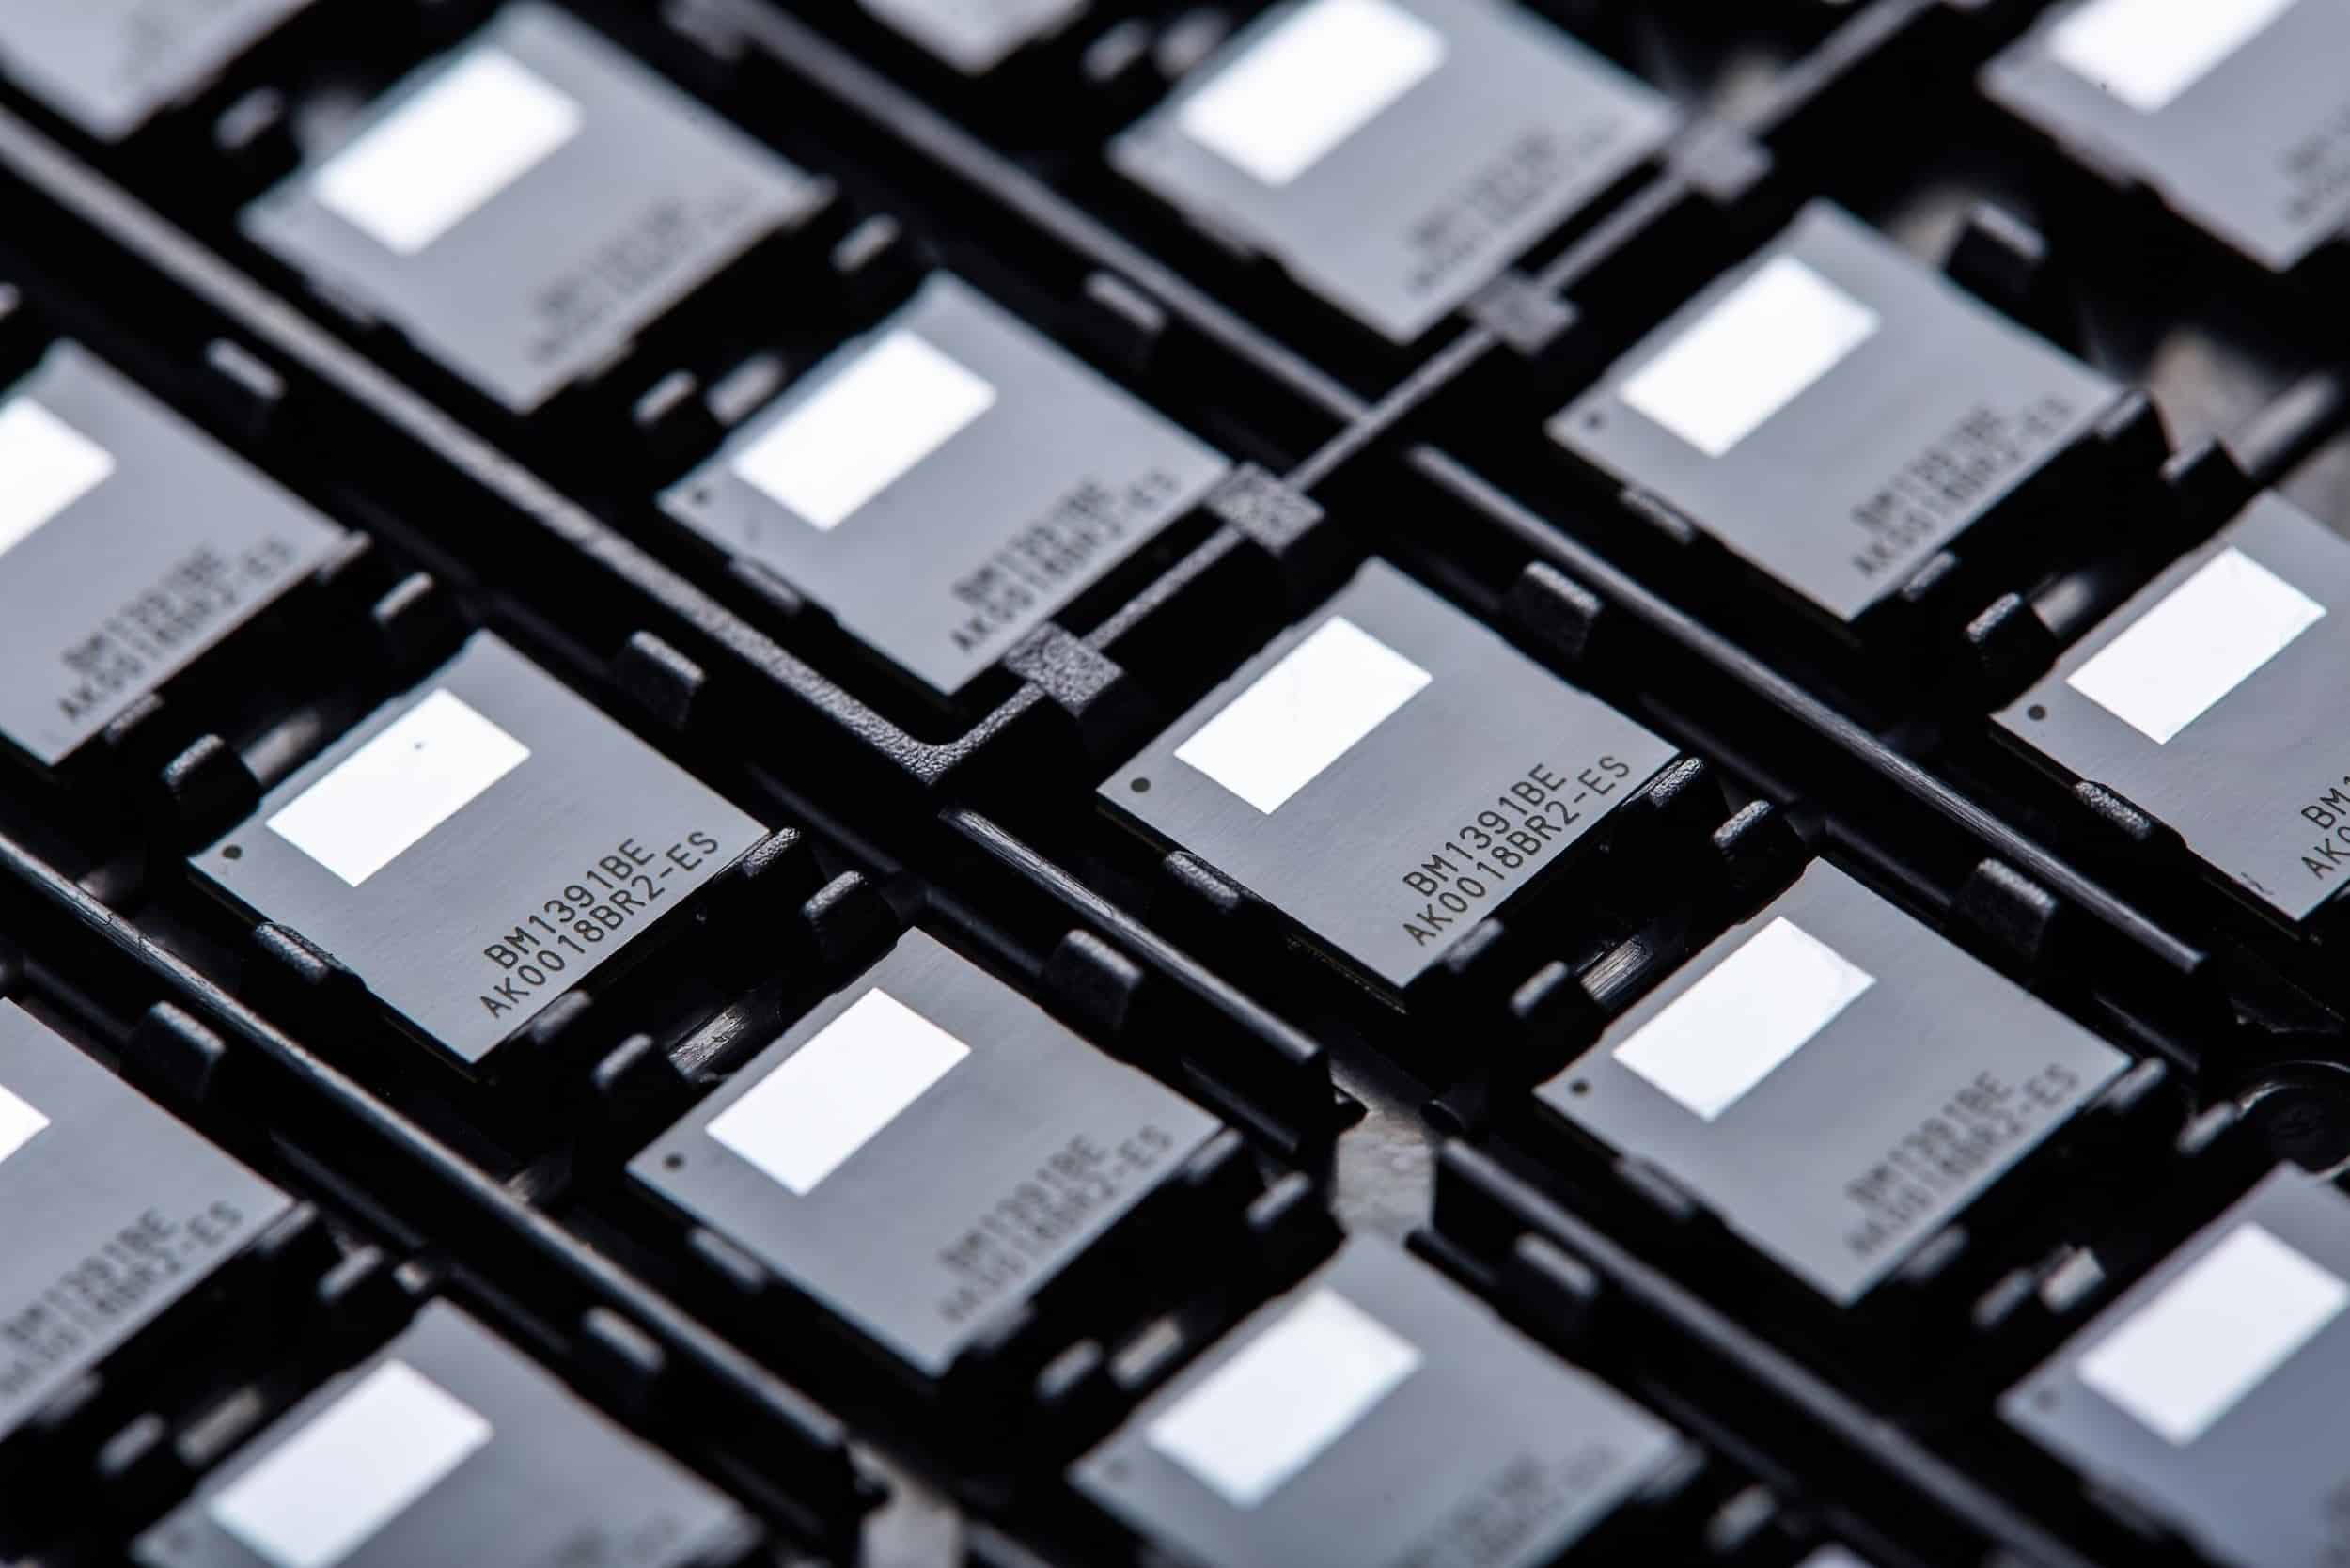 Bitmain Debuts Next Generation 7nm ASIC Chip for SHA256 Mining